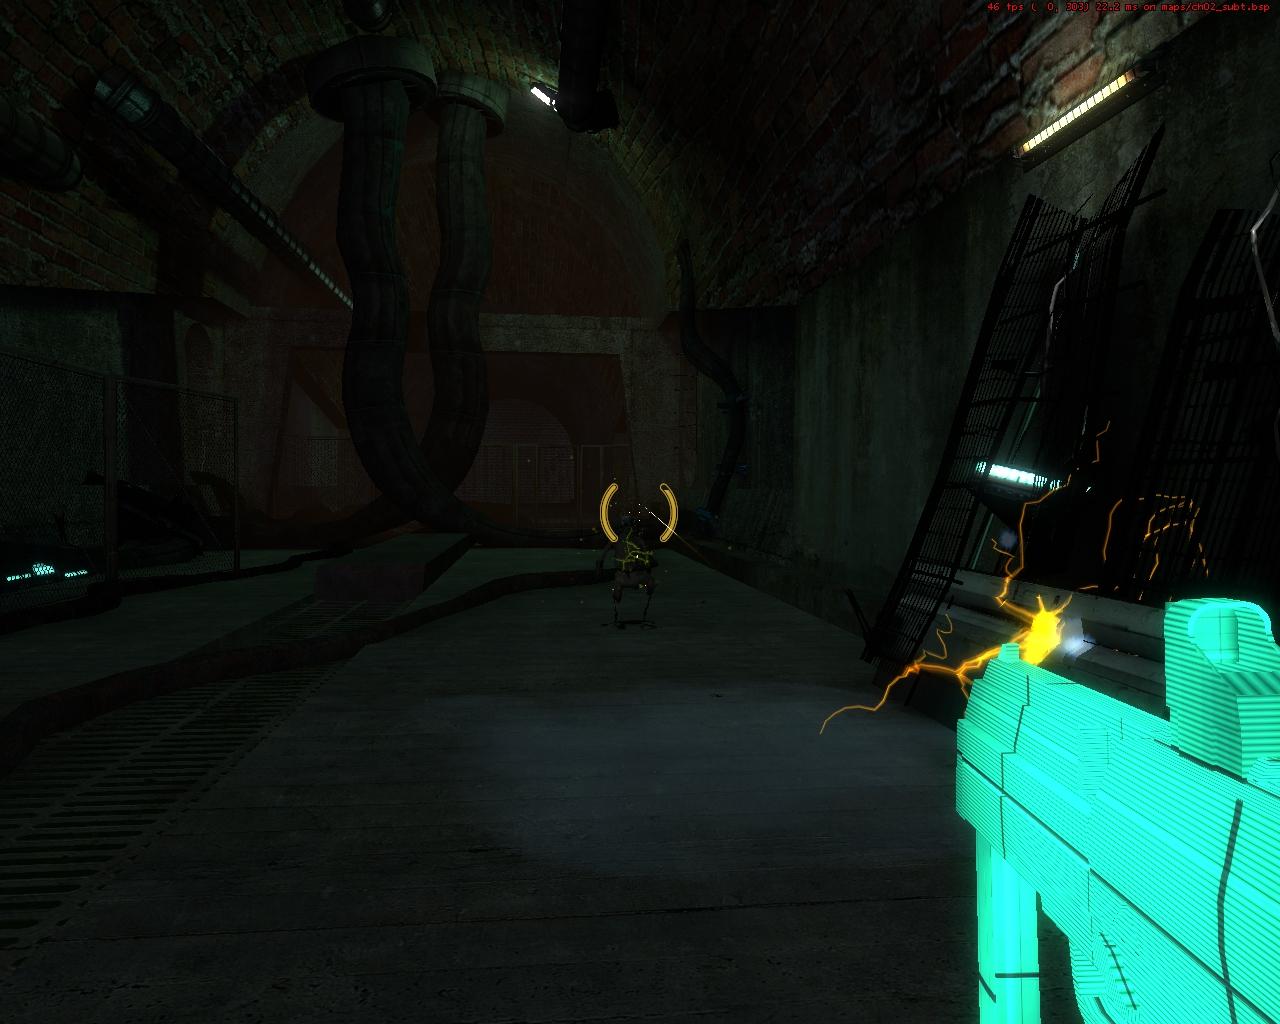 ch02_subt0065.jpg - Half-Life 2 ch02_subt, Dark Interval, Dark Interval: Part 1